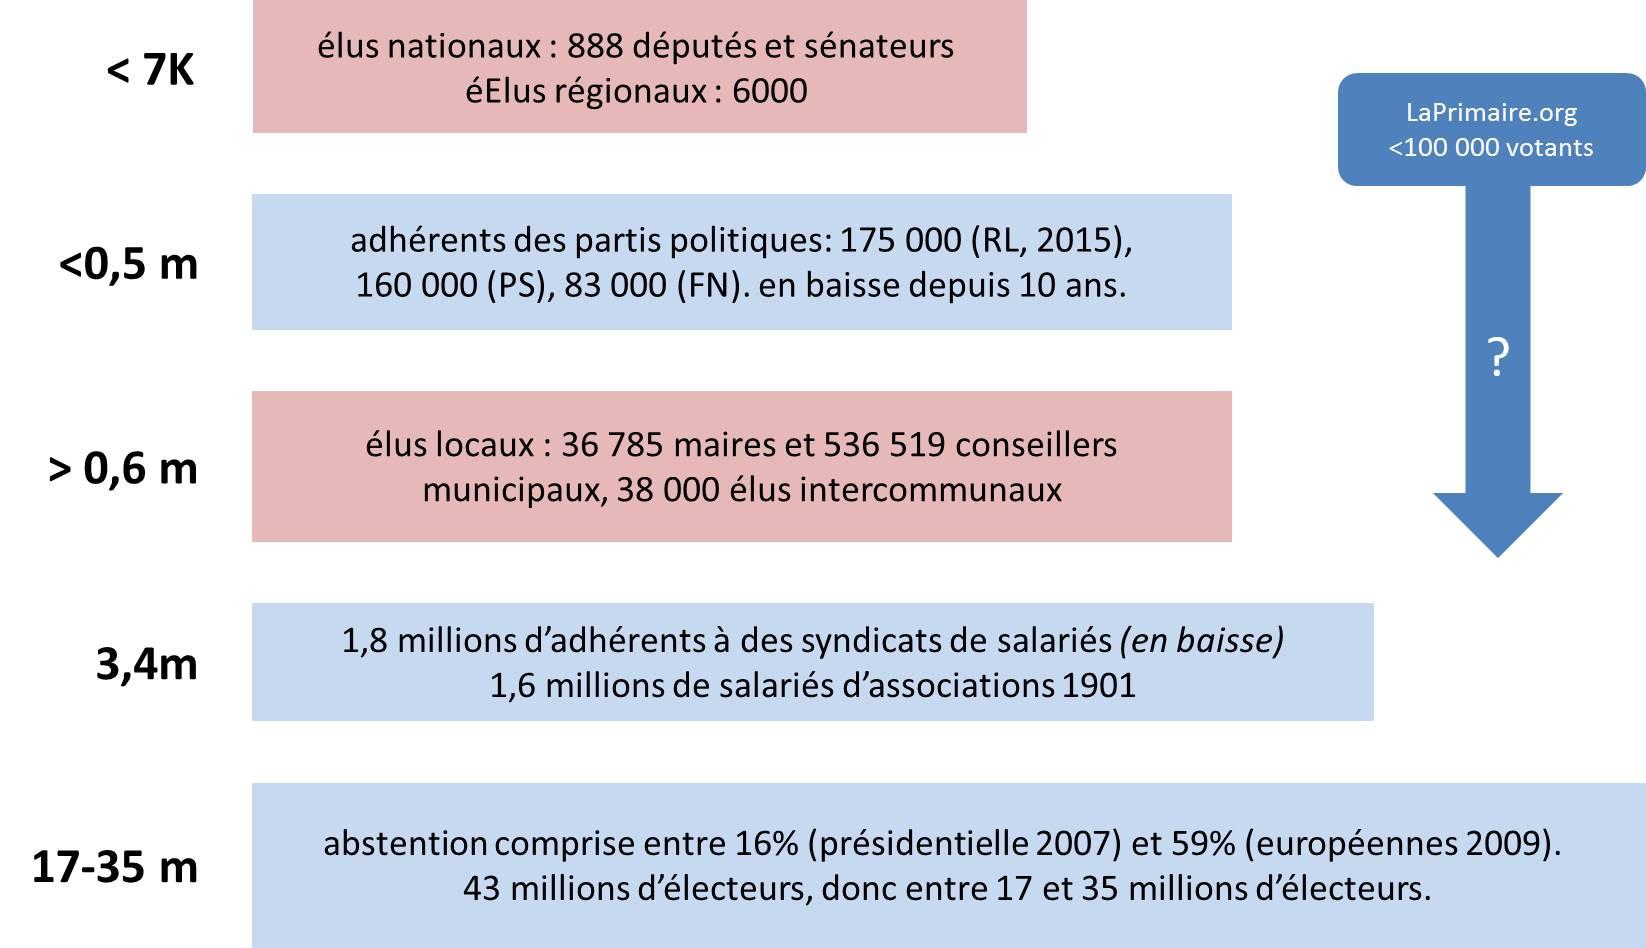 volumetrie-democratie-representative-et-participative